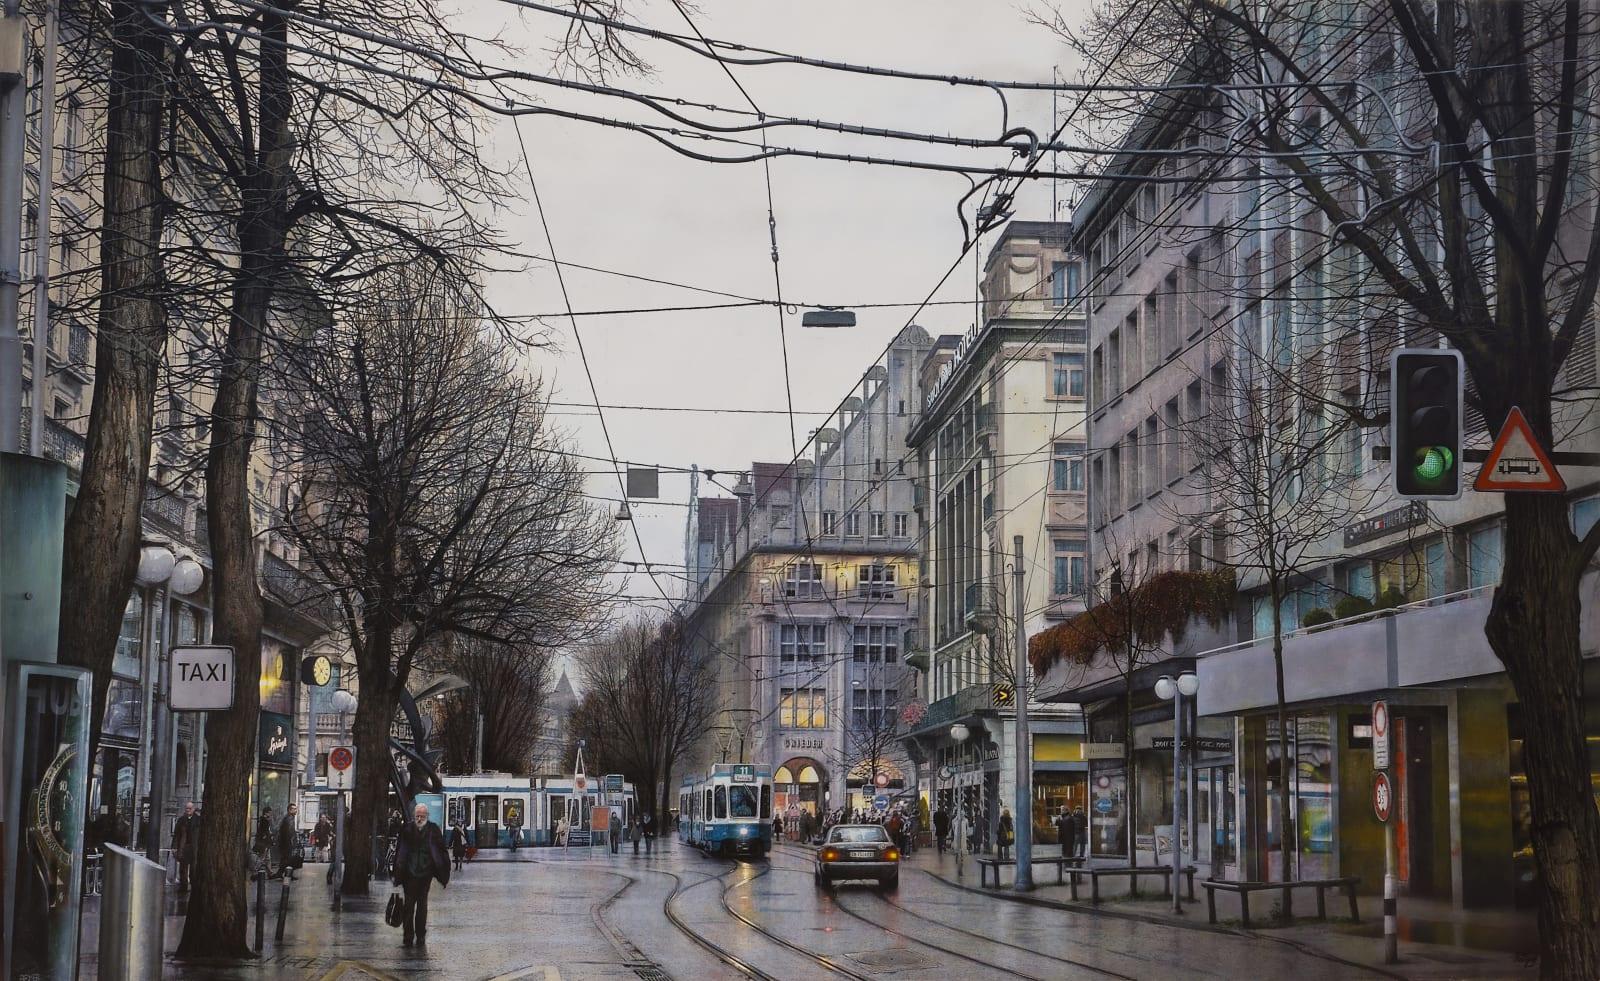 Andres Catellanos Bahnhofstrasse